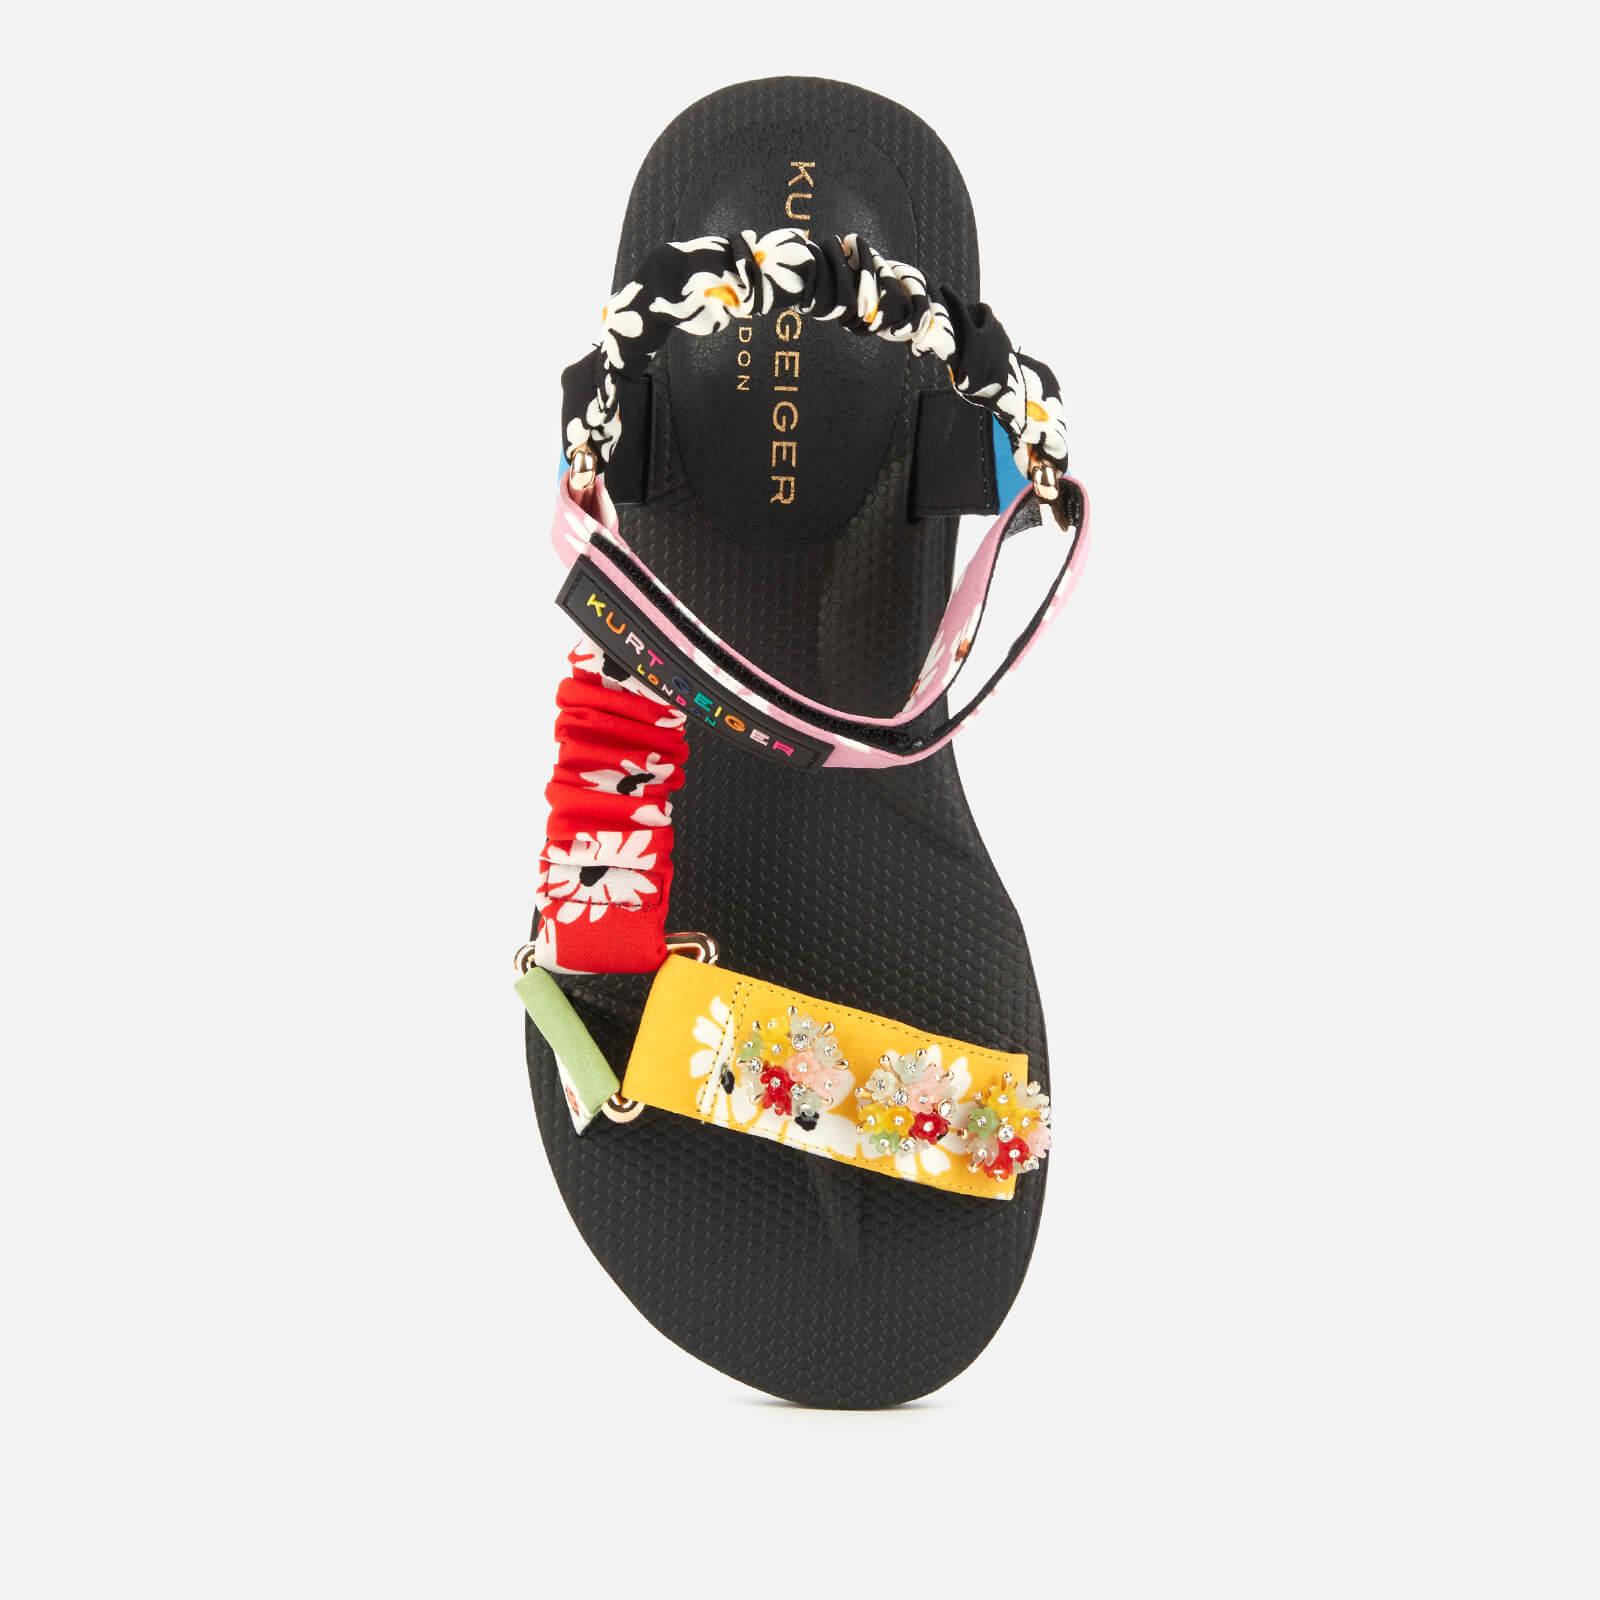 kurt geiger london women's orion trek sandals - multi - uk 5